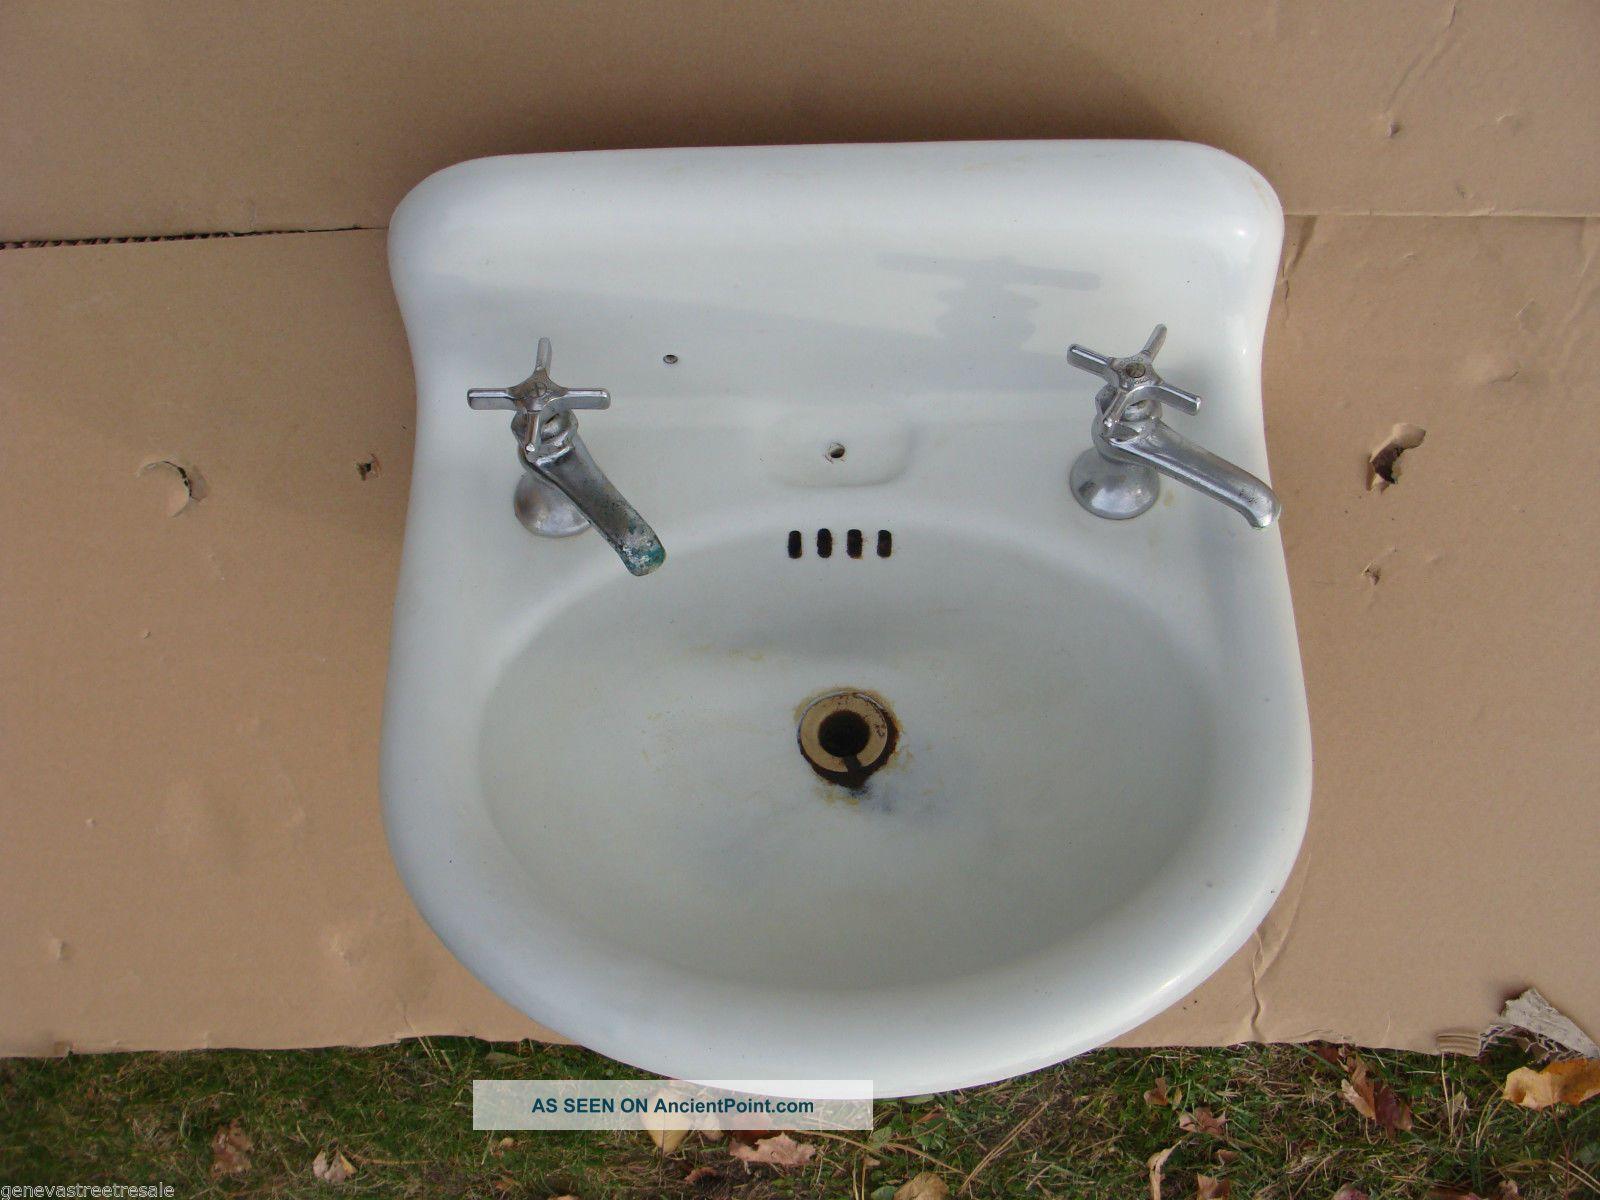 Antique Vintage Standard White Cast Iron Porcelain Sink Bathroom Plumbing 1918 Sinks photo